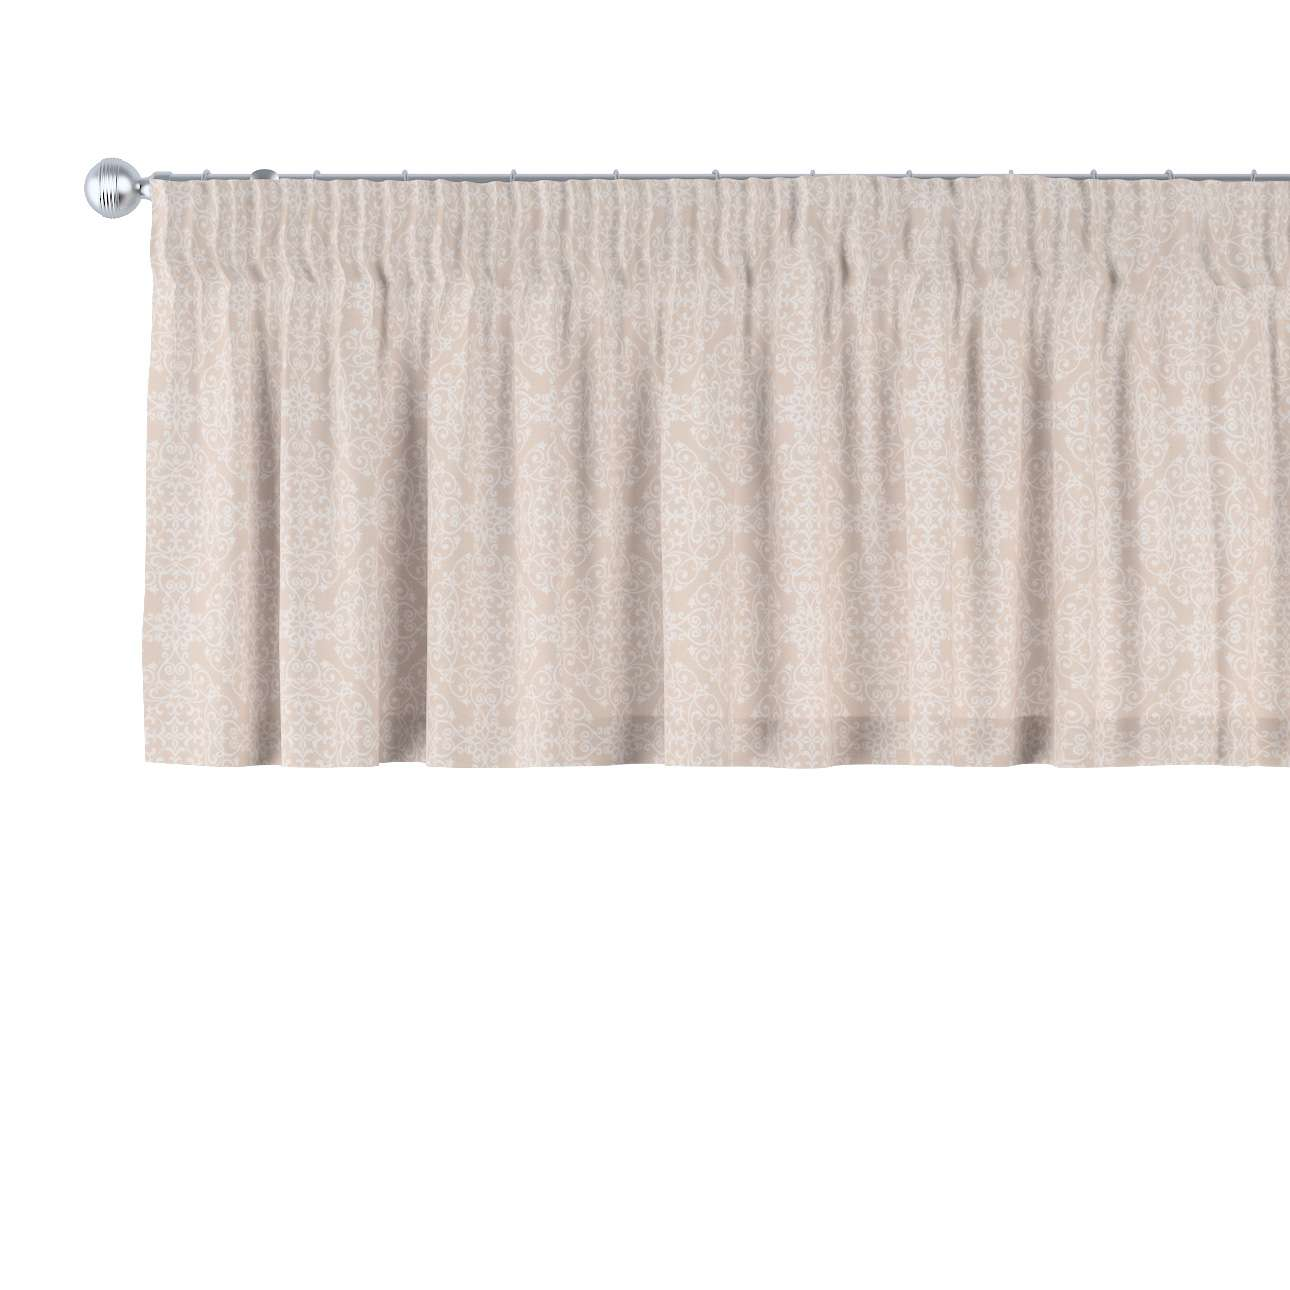 Gardinkappa med rynkband 130 x 40 cm i kollektionen Flowers, Tyg: 140-39